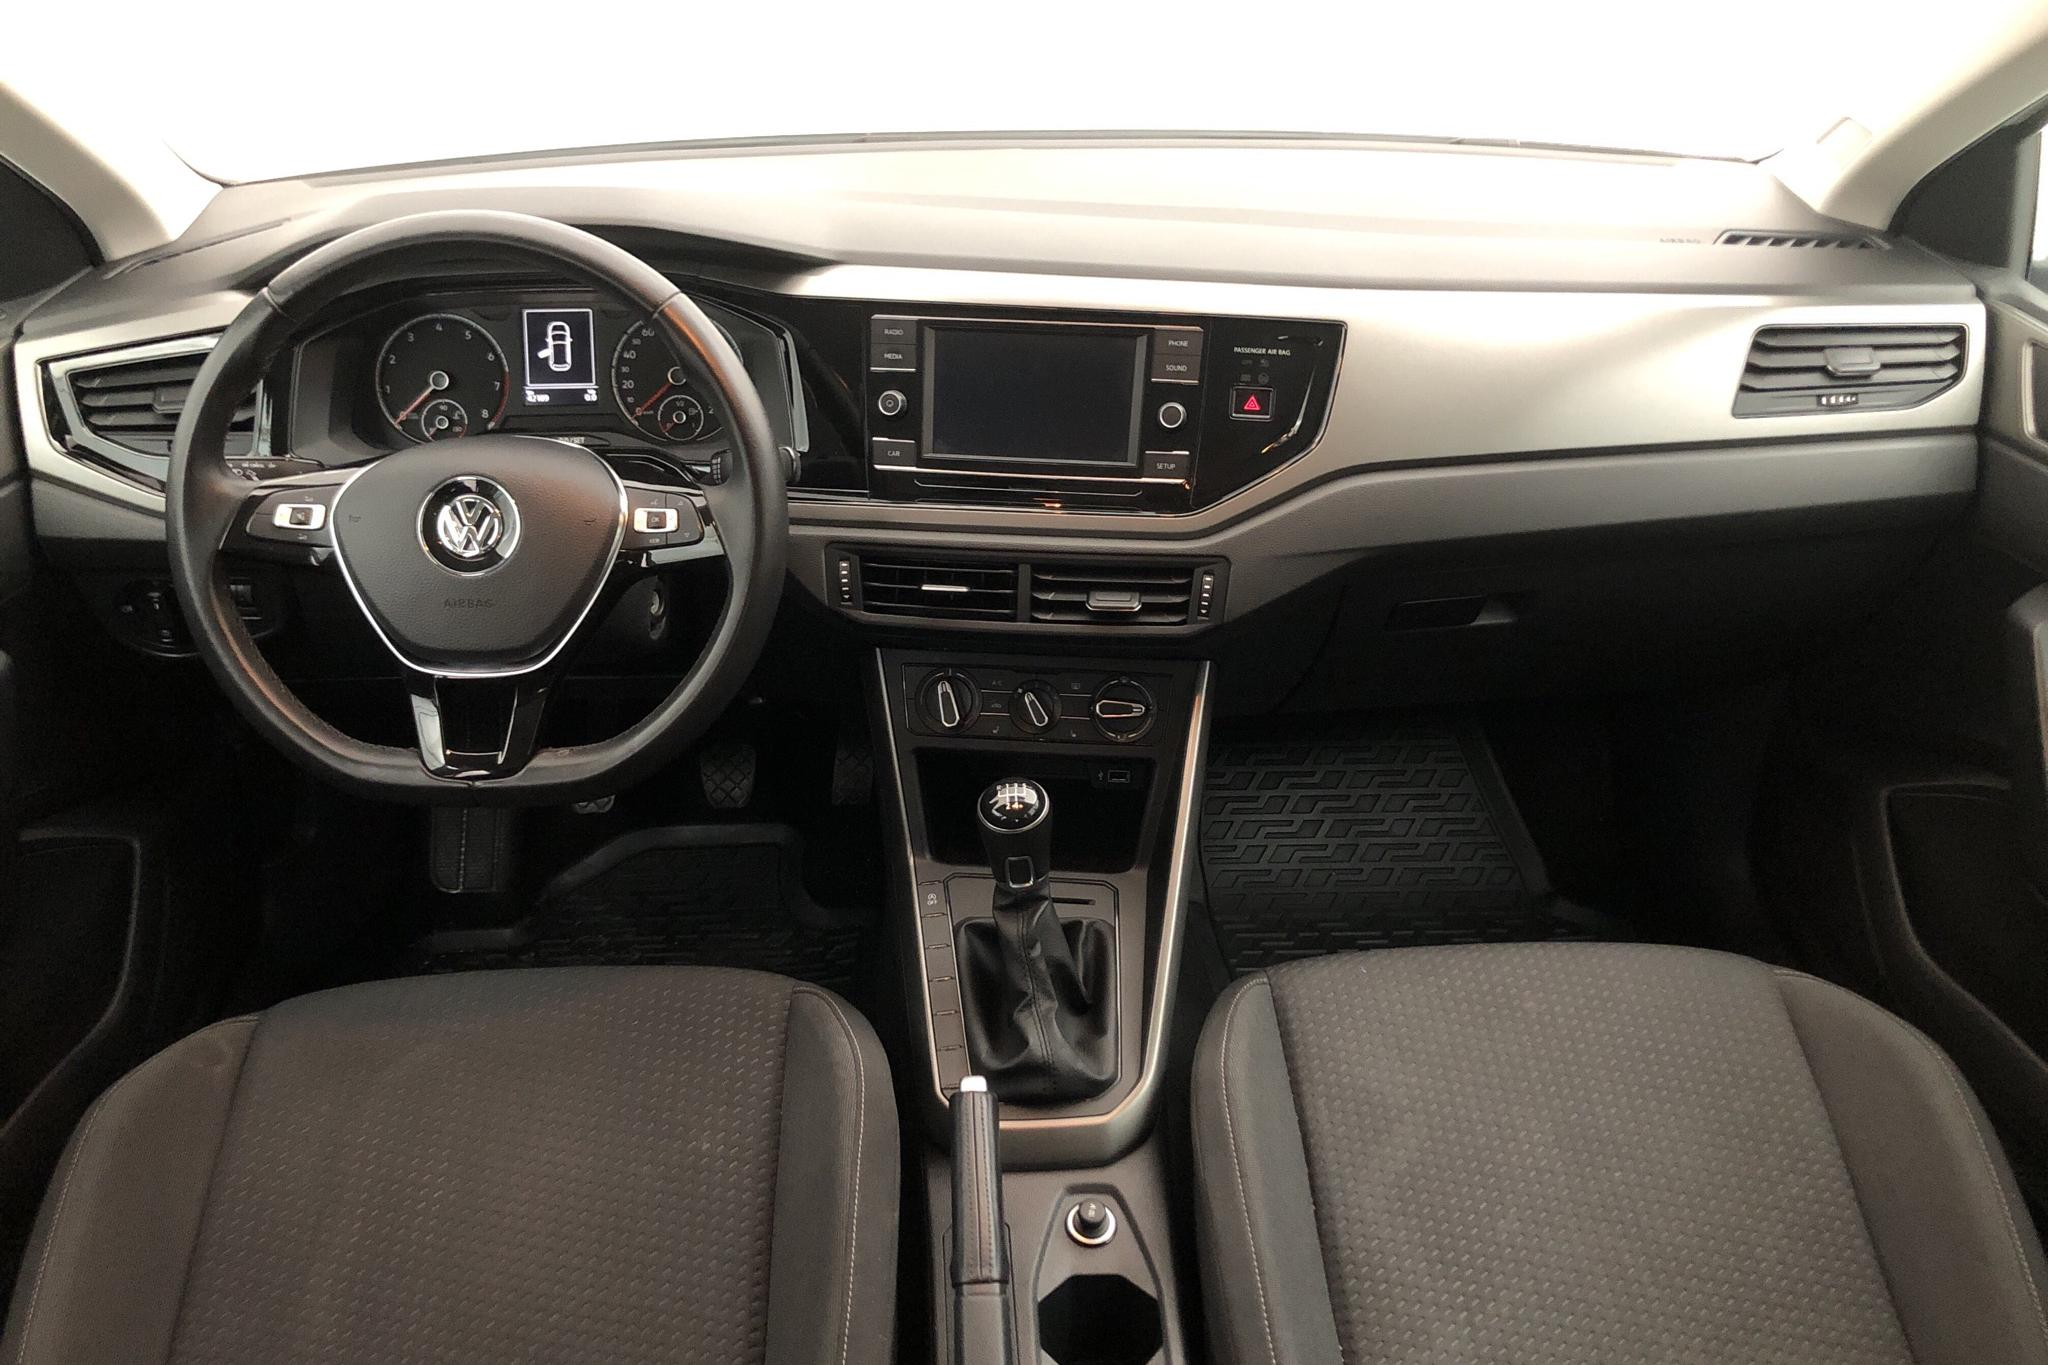 VW Polo 1.0 TSI 5dr (95hk) - 4 220 mil - Manuell - vit - 2018